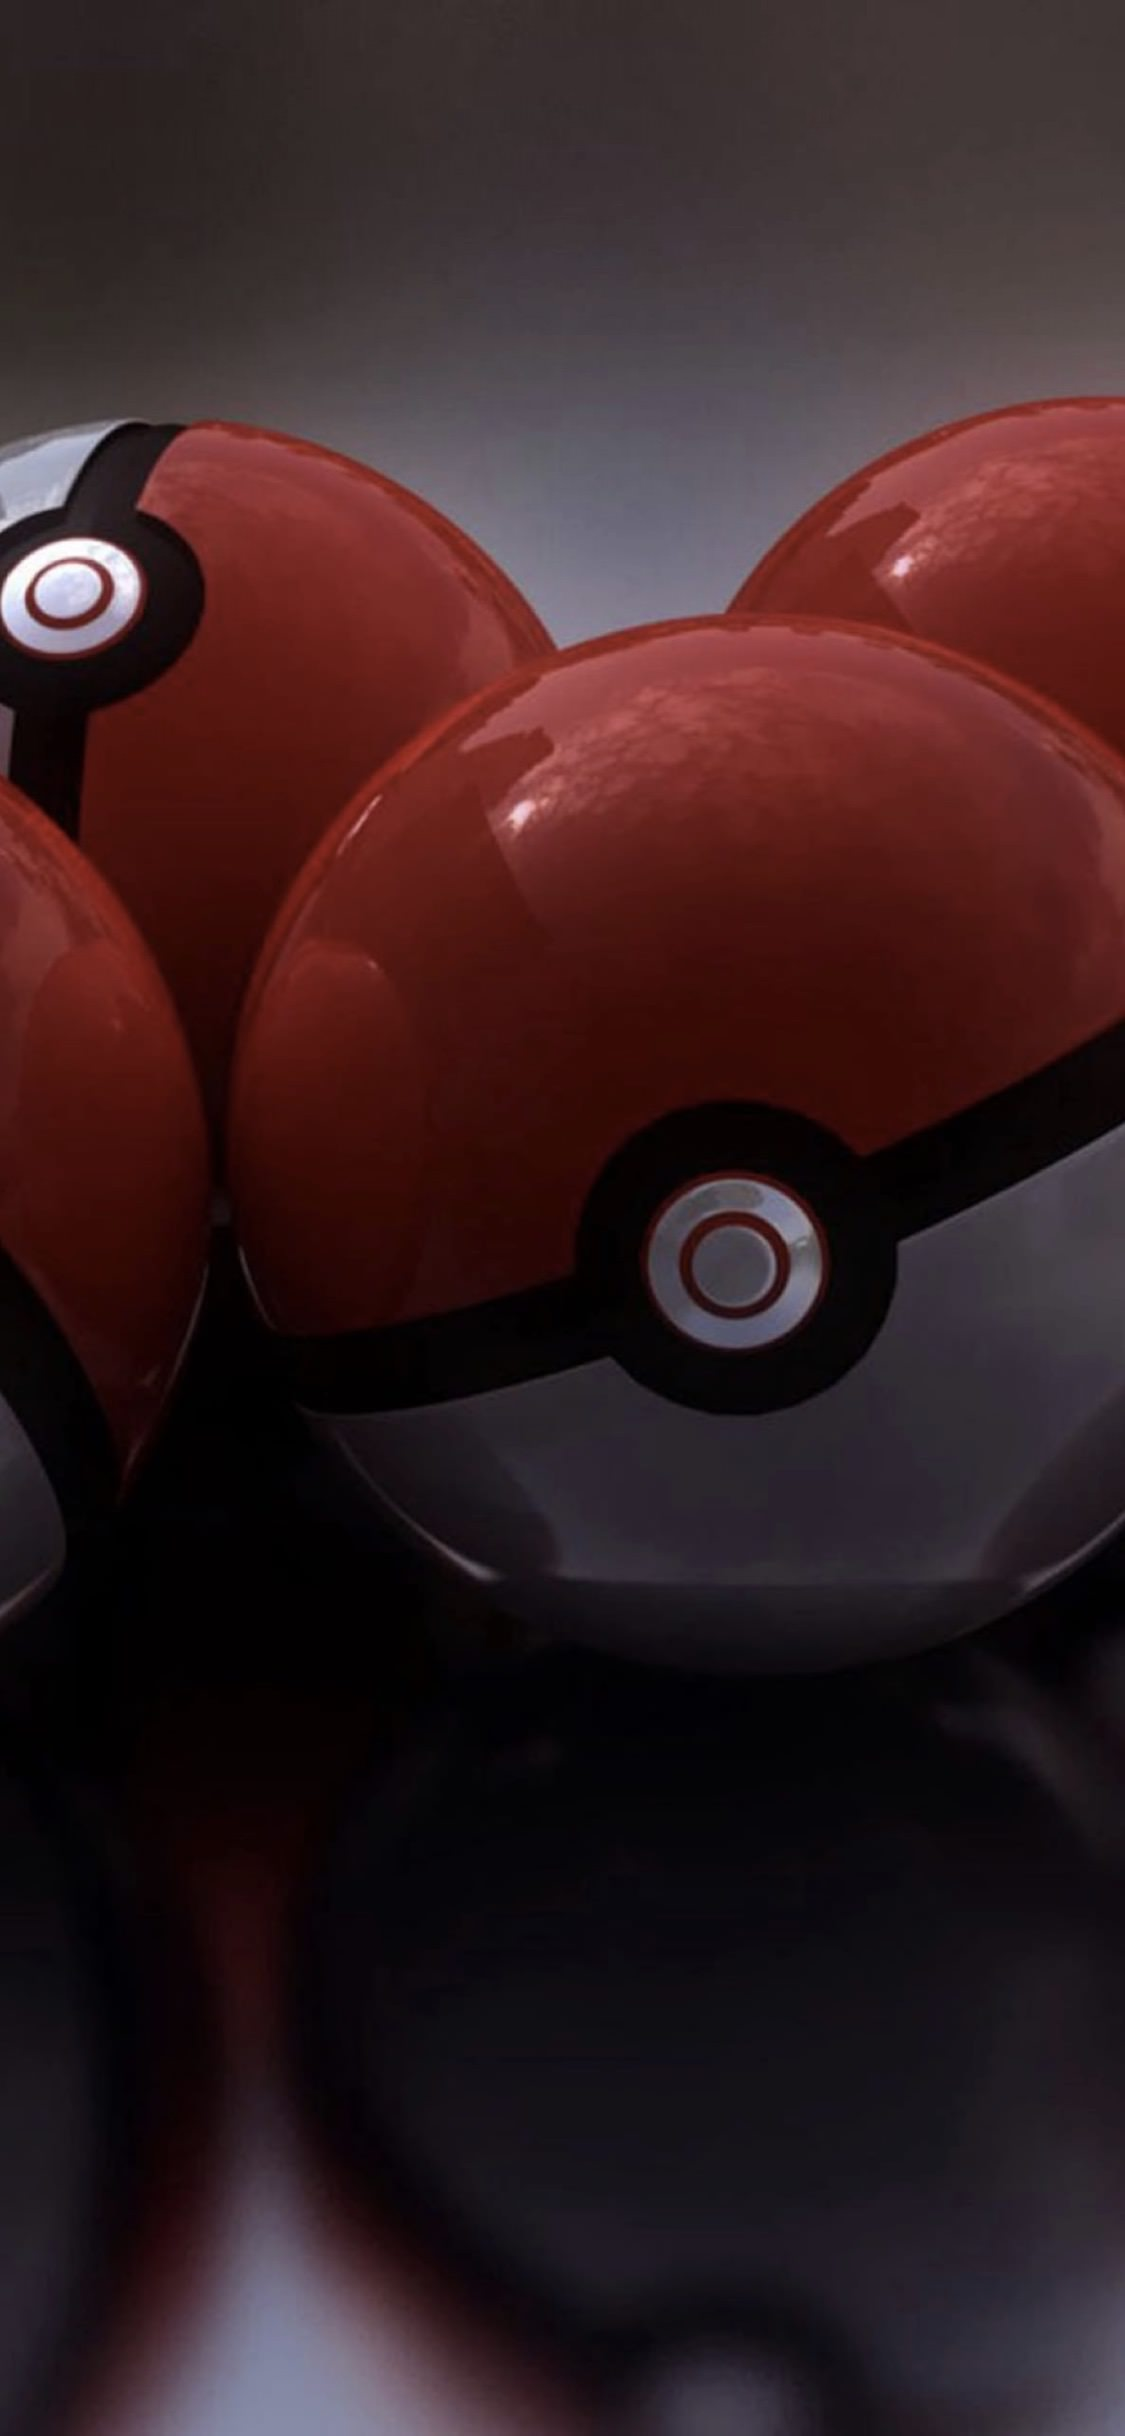 Pokemon monster ball style wallpapersc iPhoneXS 1125x2436